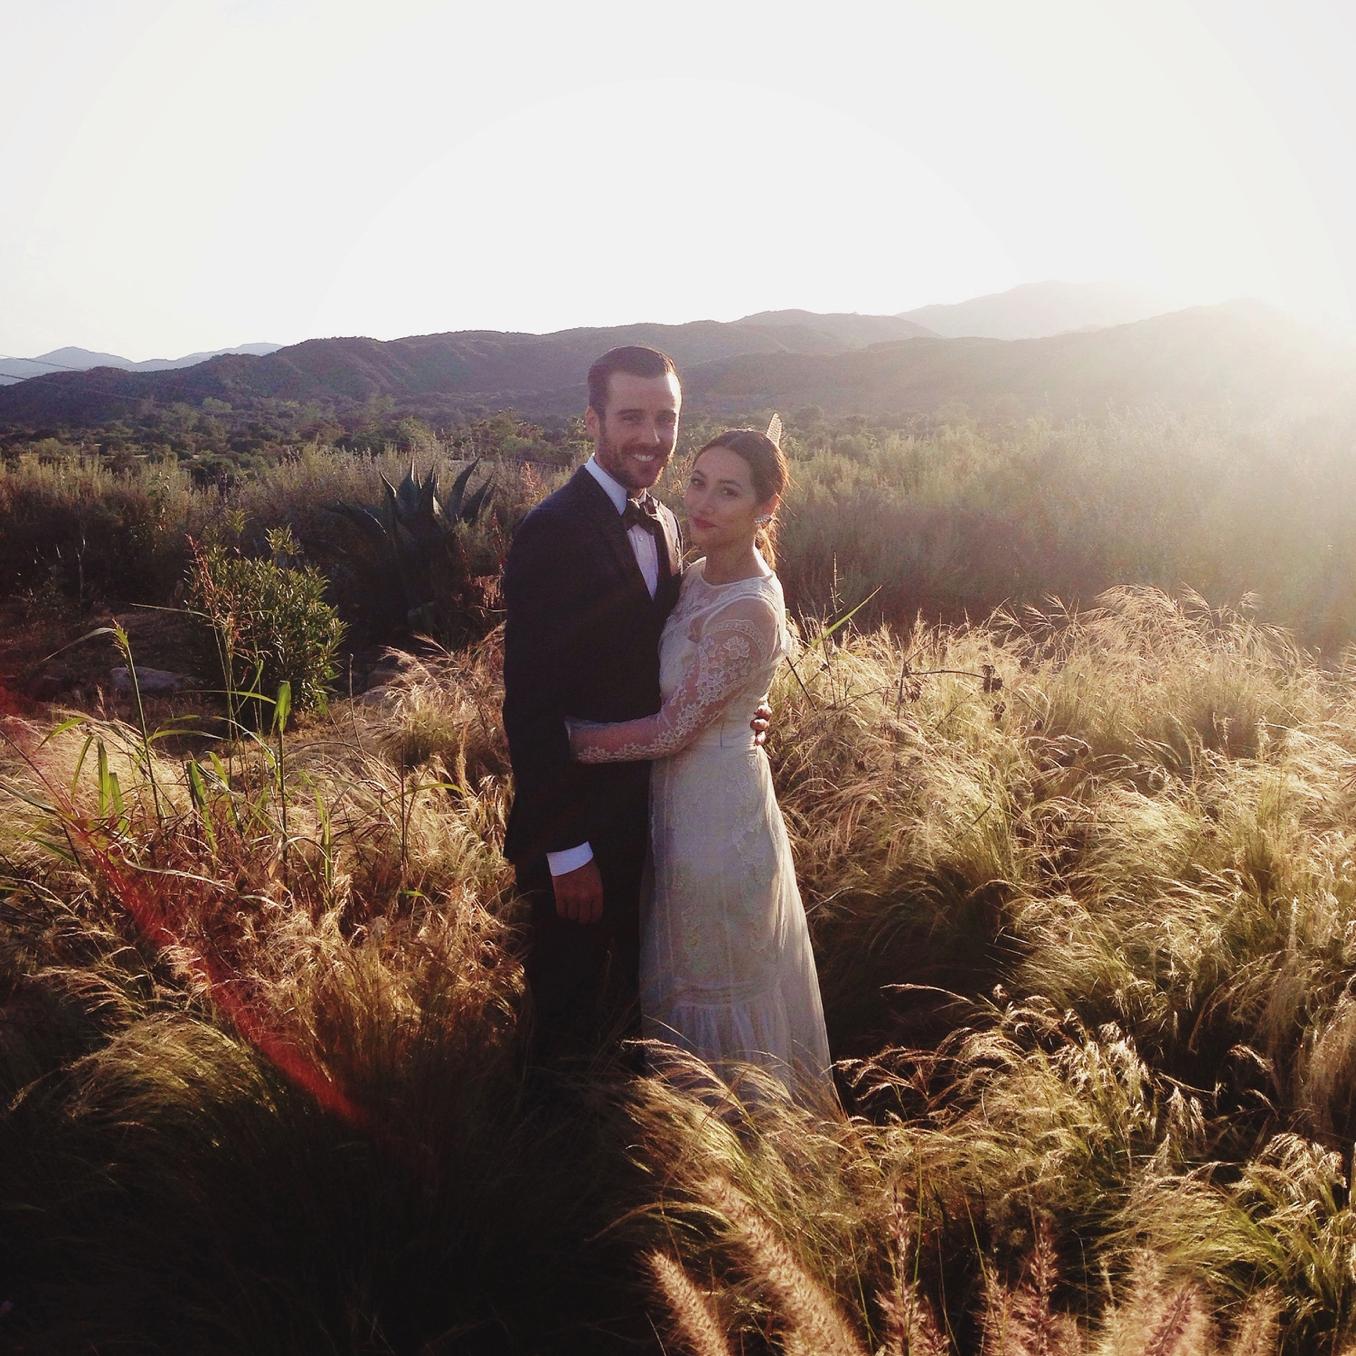 Tessa and Andy's gorgeous Ojai wedding photo by STUDIO 1208